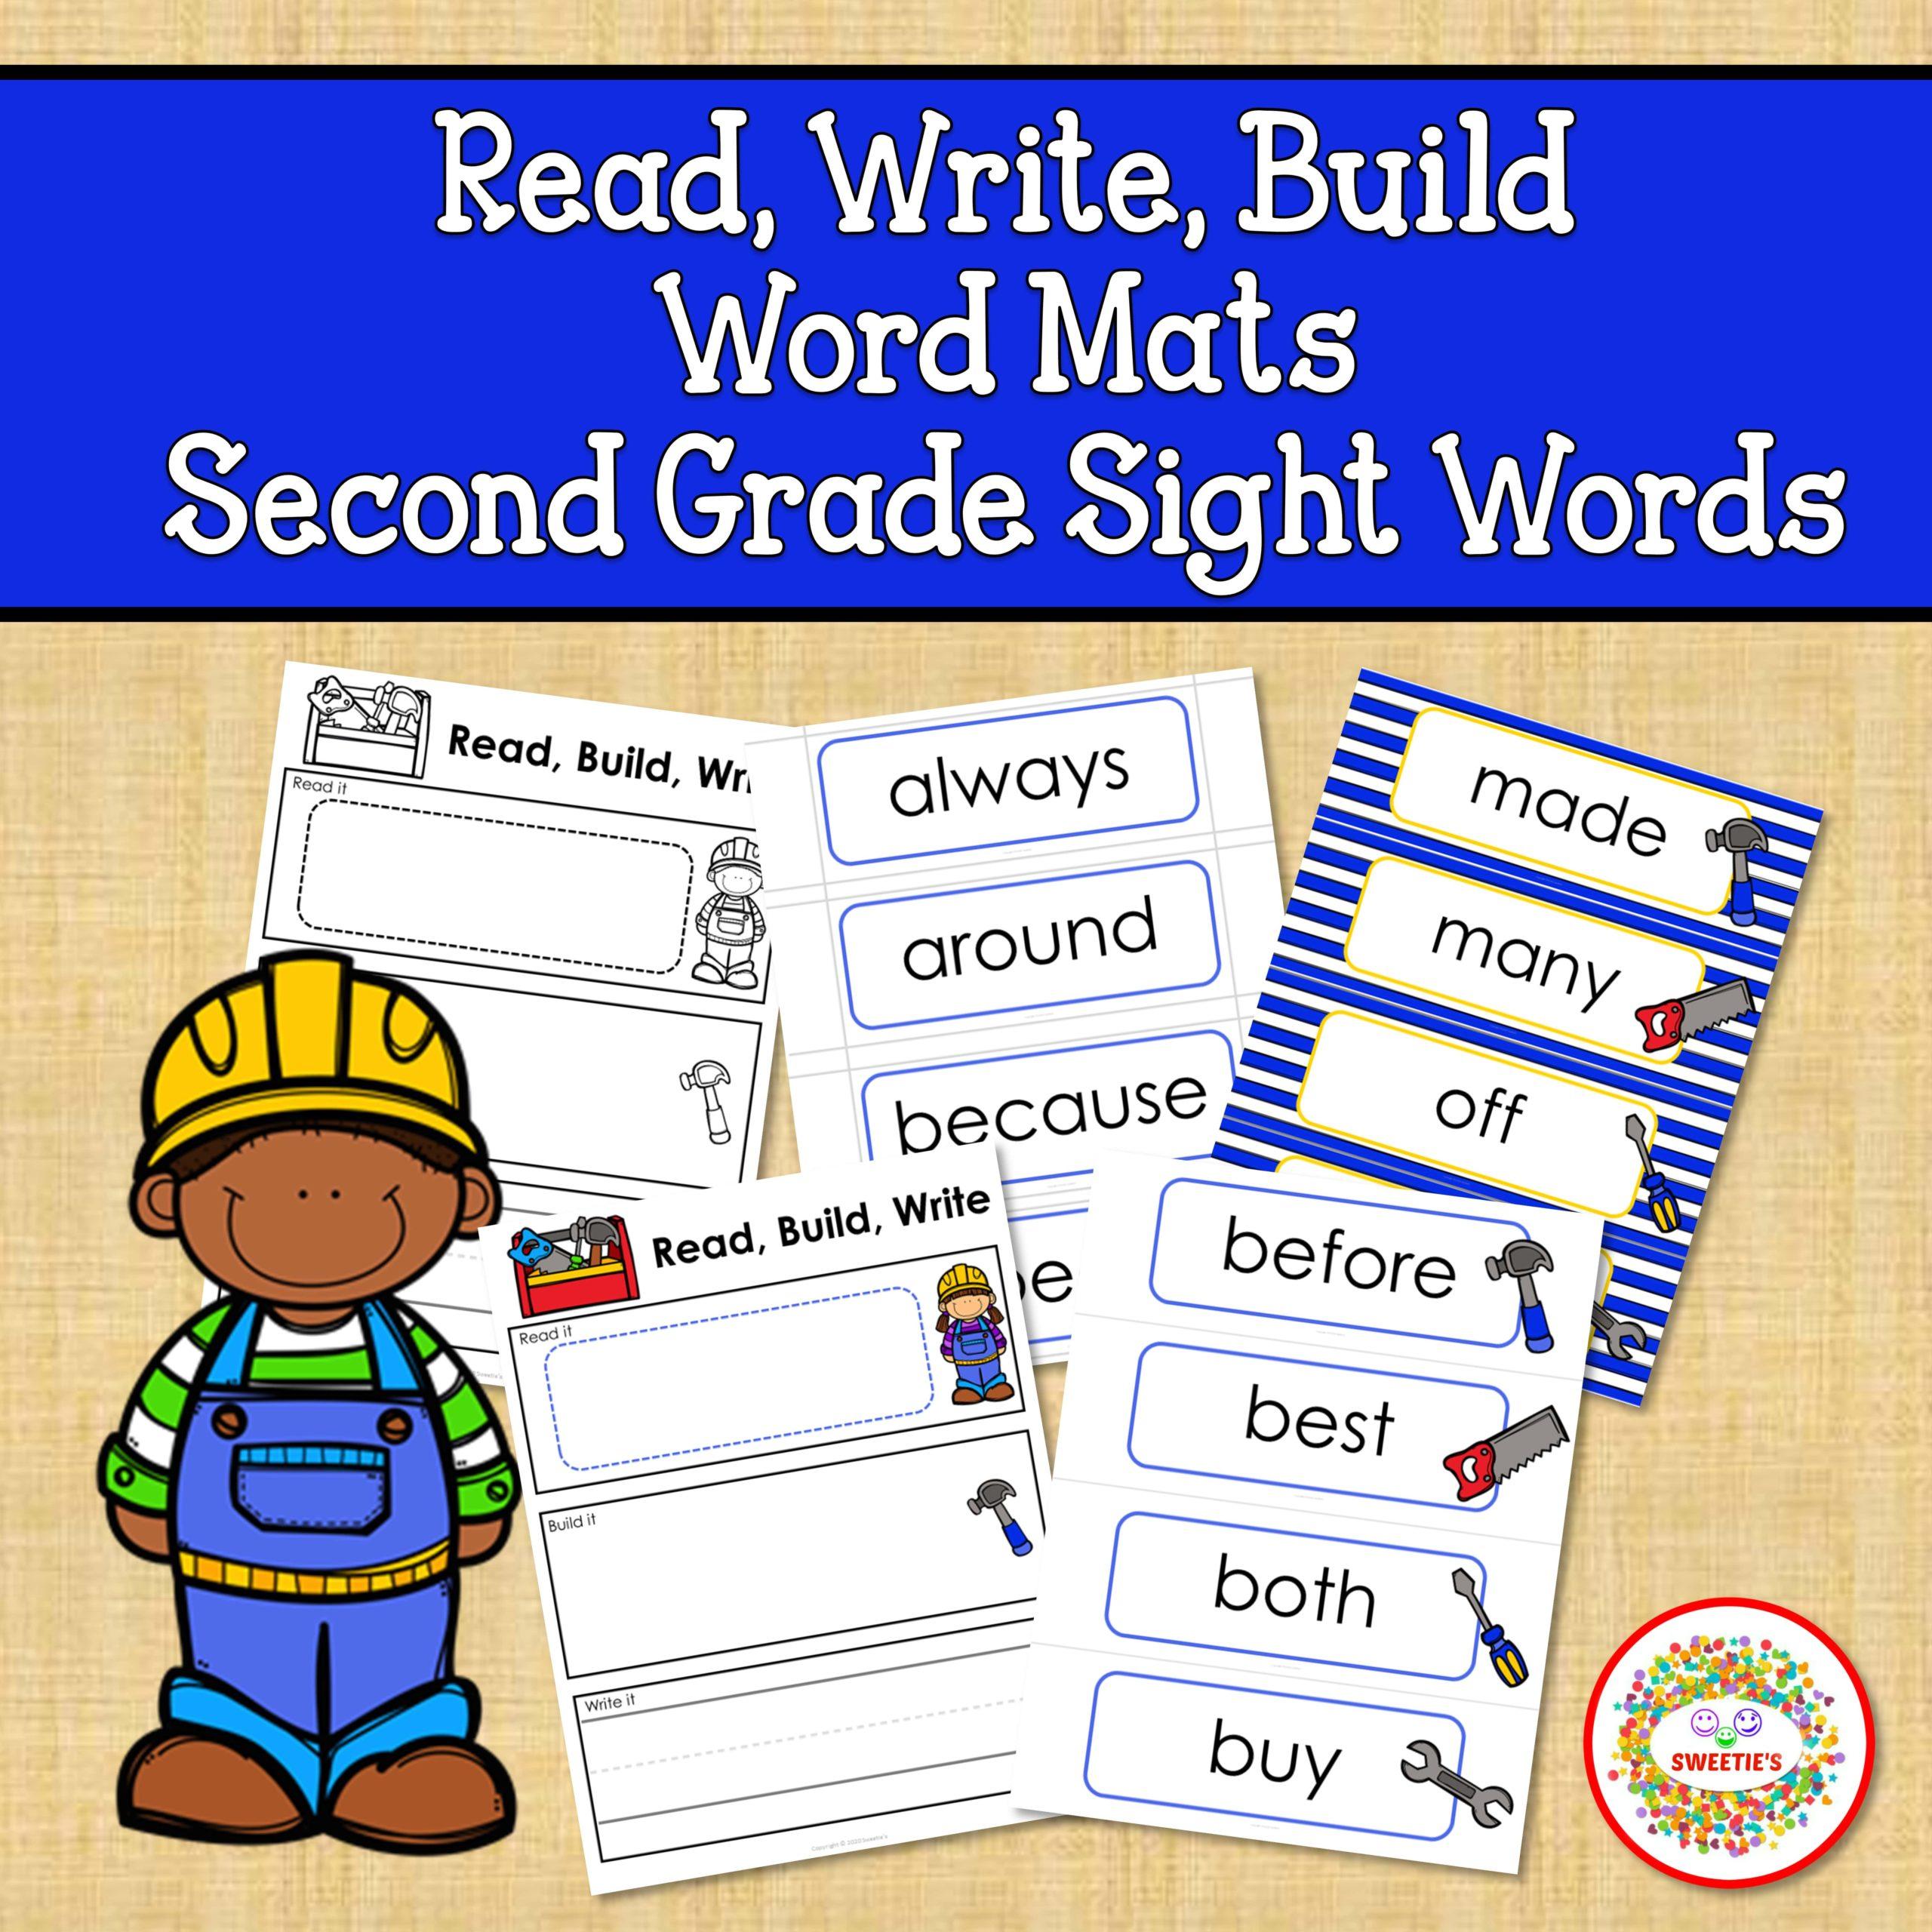 Sight Words Read, Build, Second Grade Sight Words